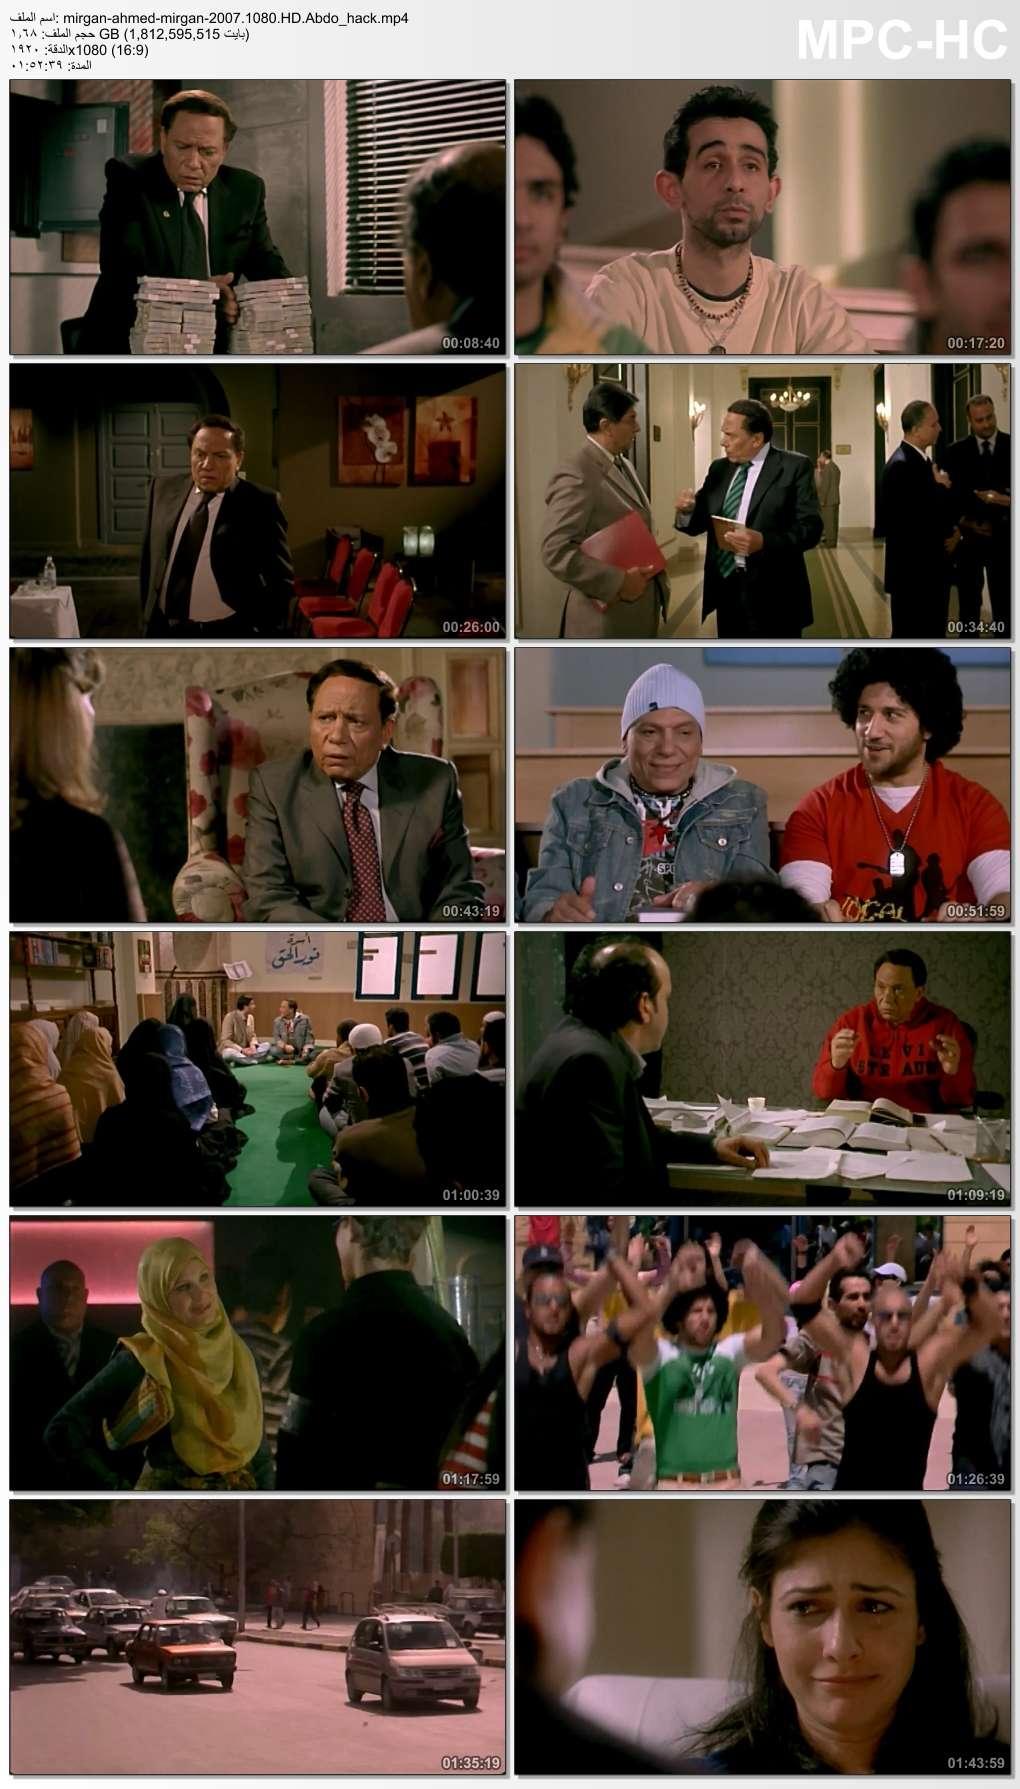 [فيلم][تورنت][تحميل][مرجان أحمد مرجان][2007][1080p][Web-DL] 5 arabp2p.com